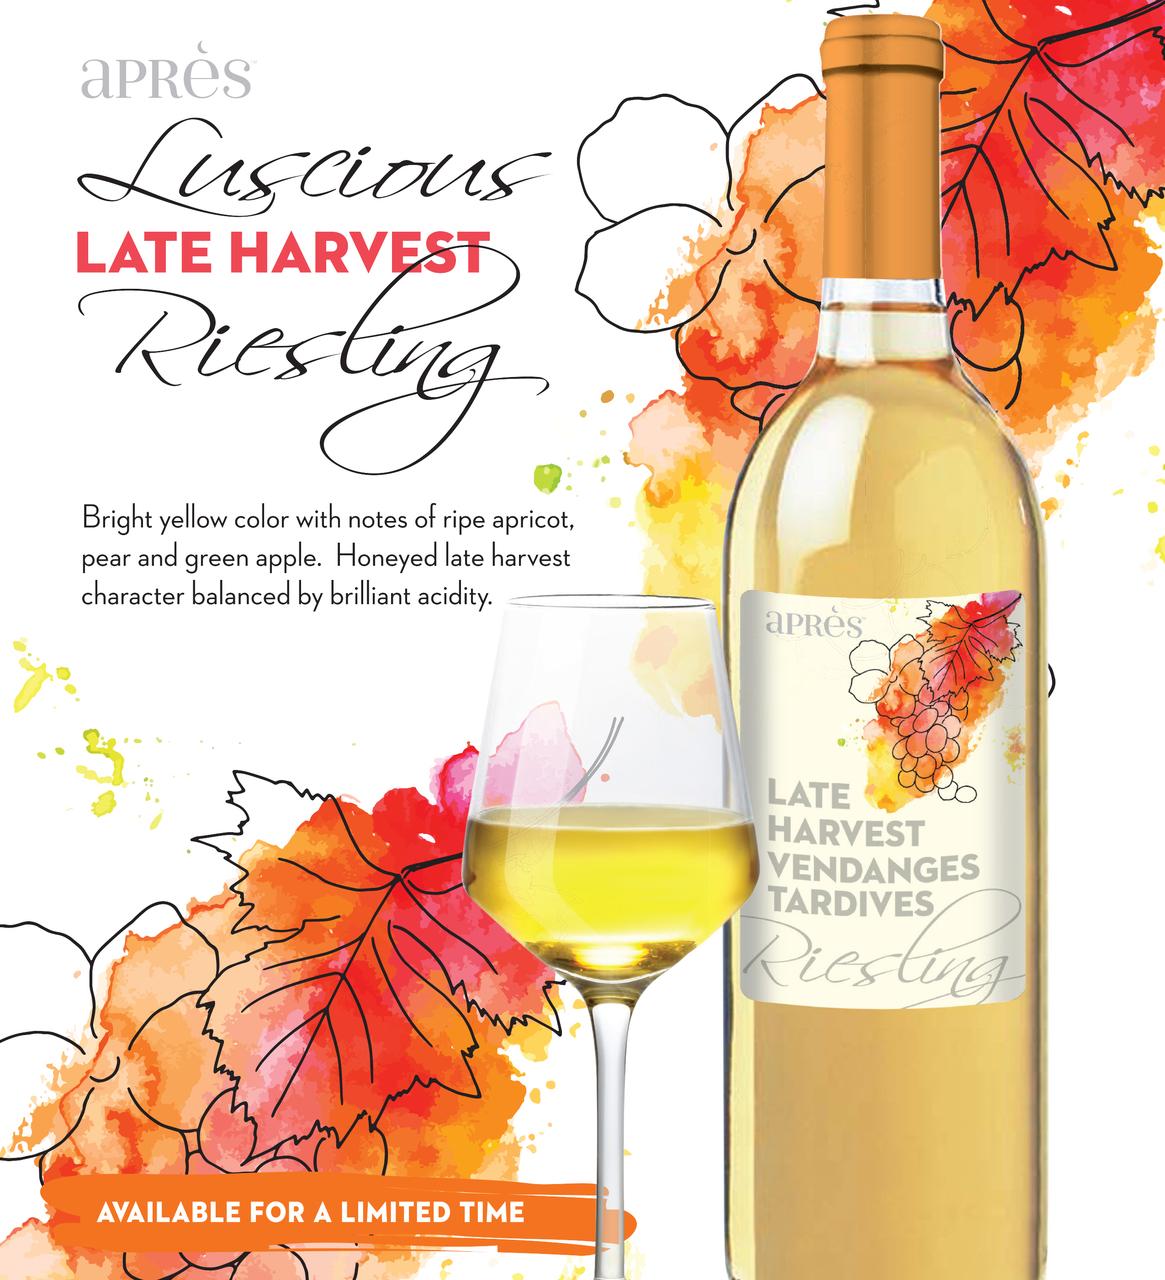 late-harvest-00968.1564584927.1280.1280.jpg